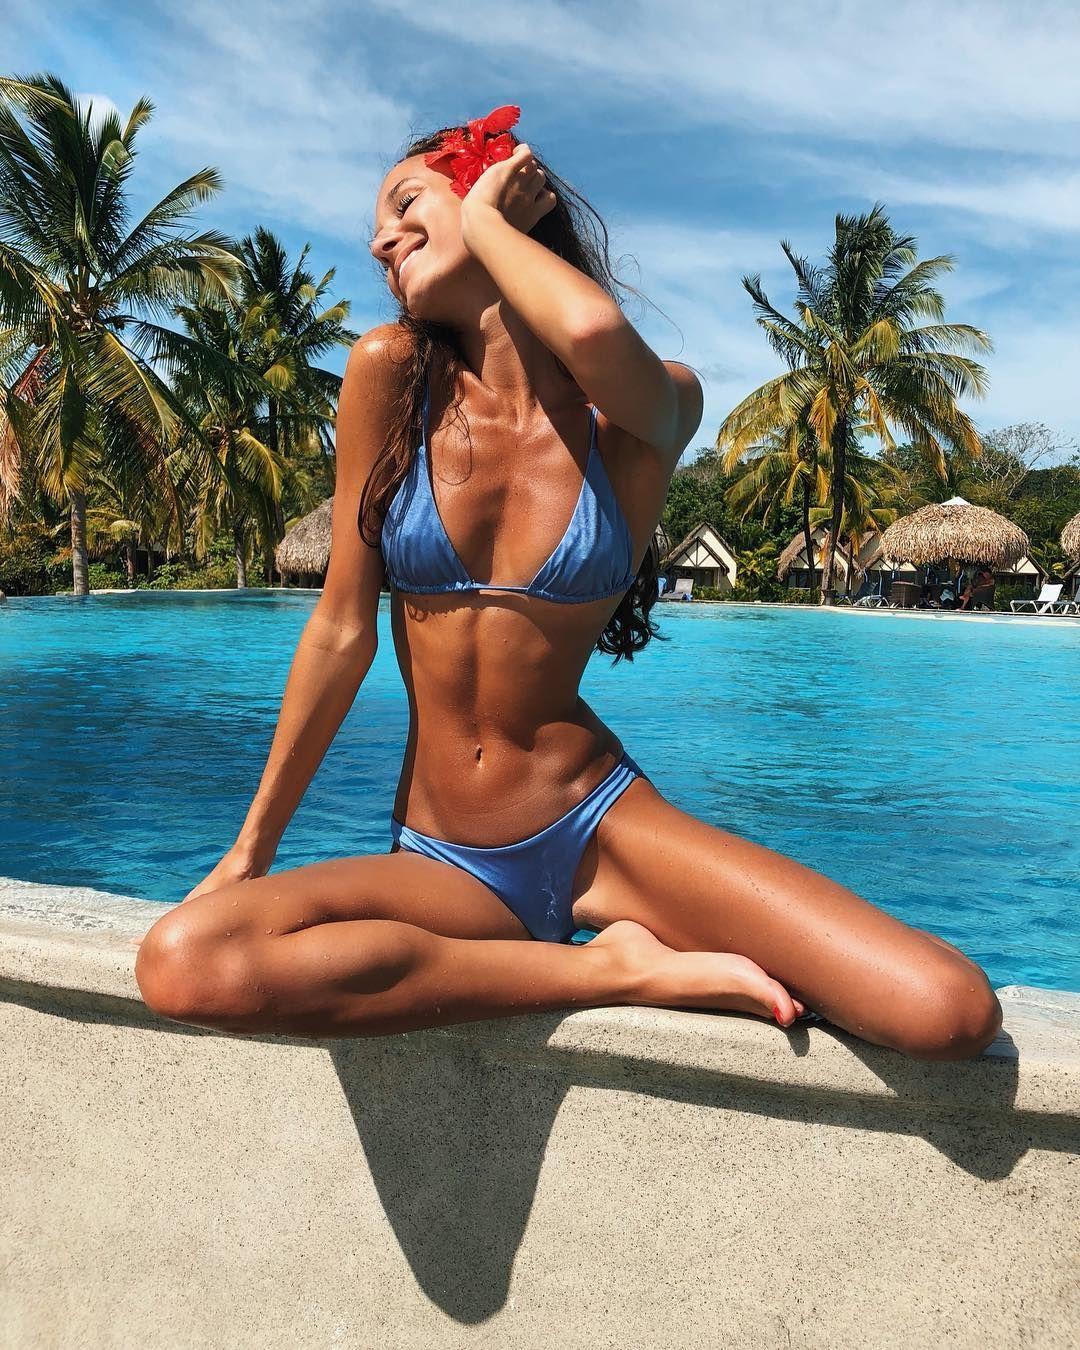 Carlota Ensenat nude (82 foto and video), Topless, Bikini, Twitter, lingerie 2019